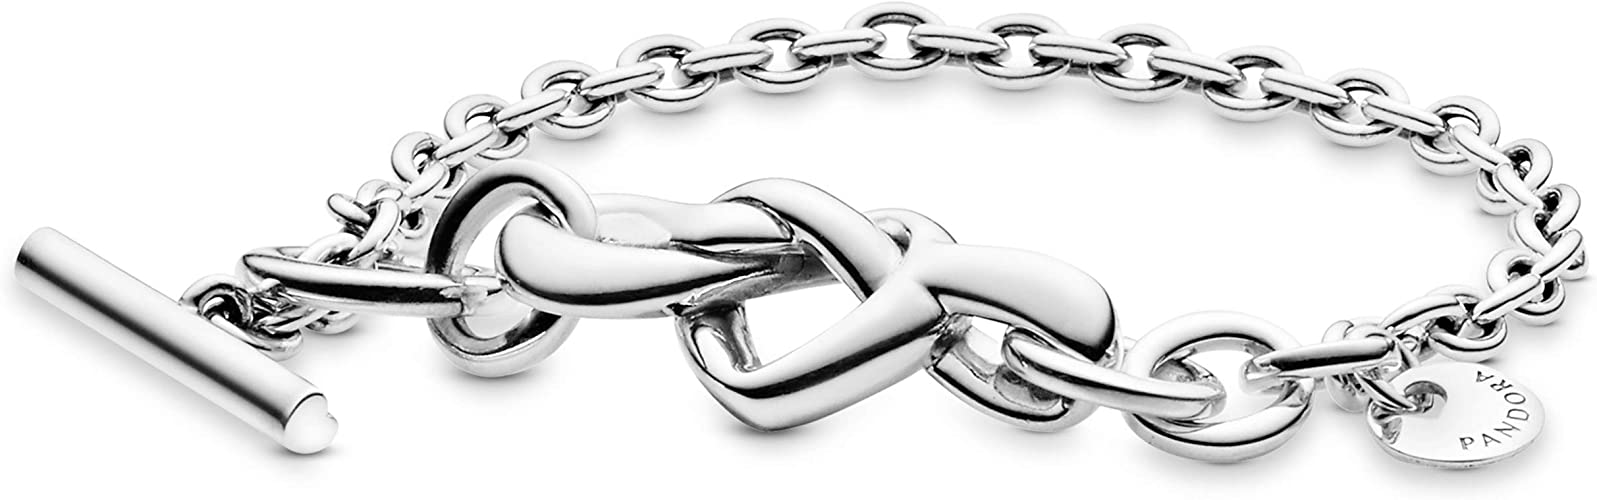 Pandora Jewelry Knotted Heart T-Bar Sterling Silver Bracelet, Size 7.1